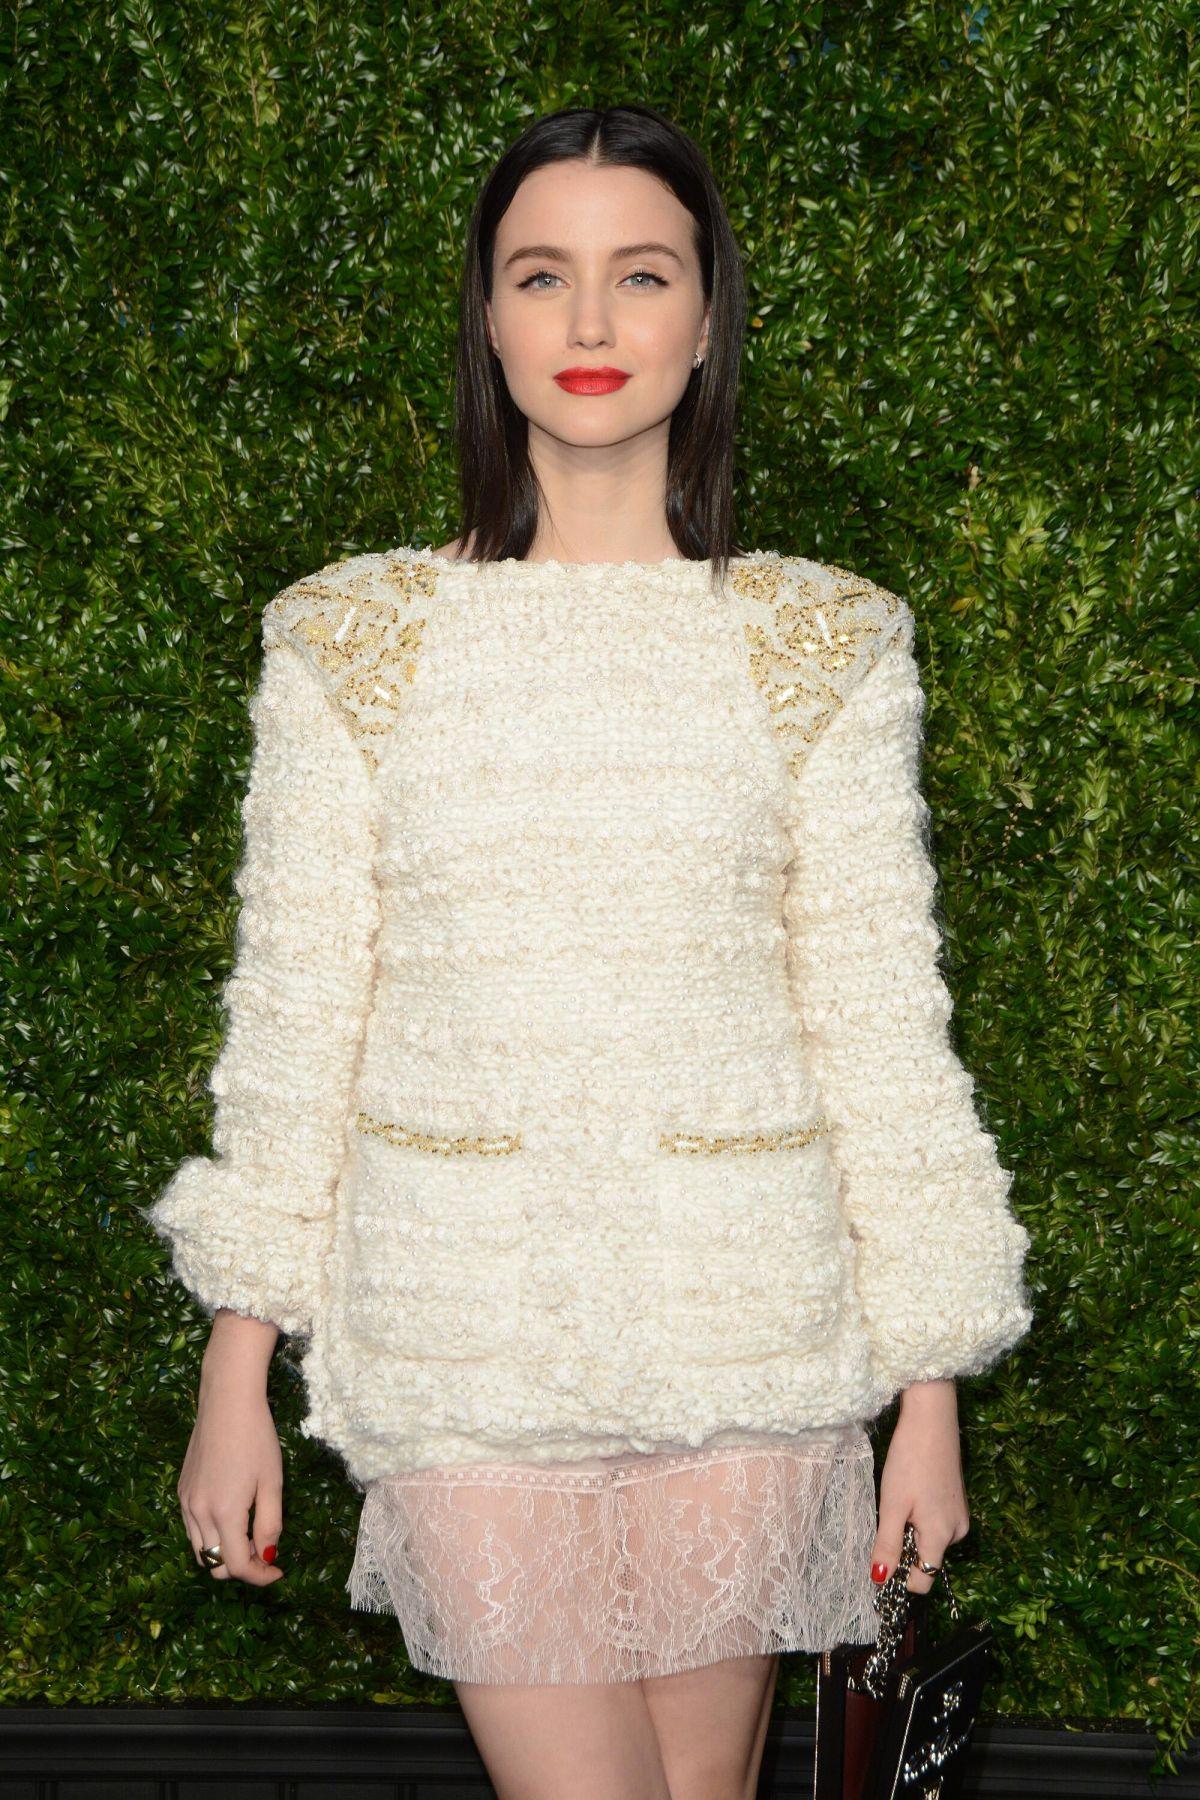 JULIA GOLDANI TELLES at Chanel Artists Dinner at Tribeca Film Festival in New York 04/24/2017